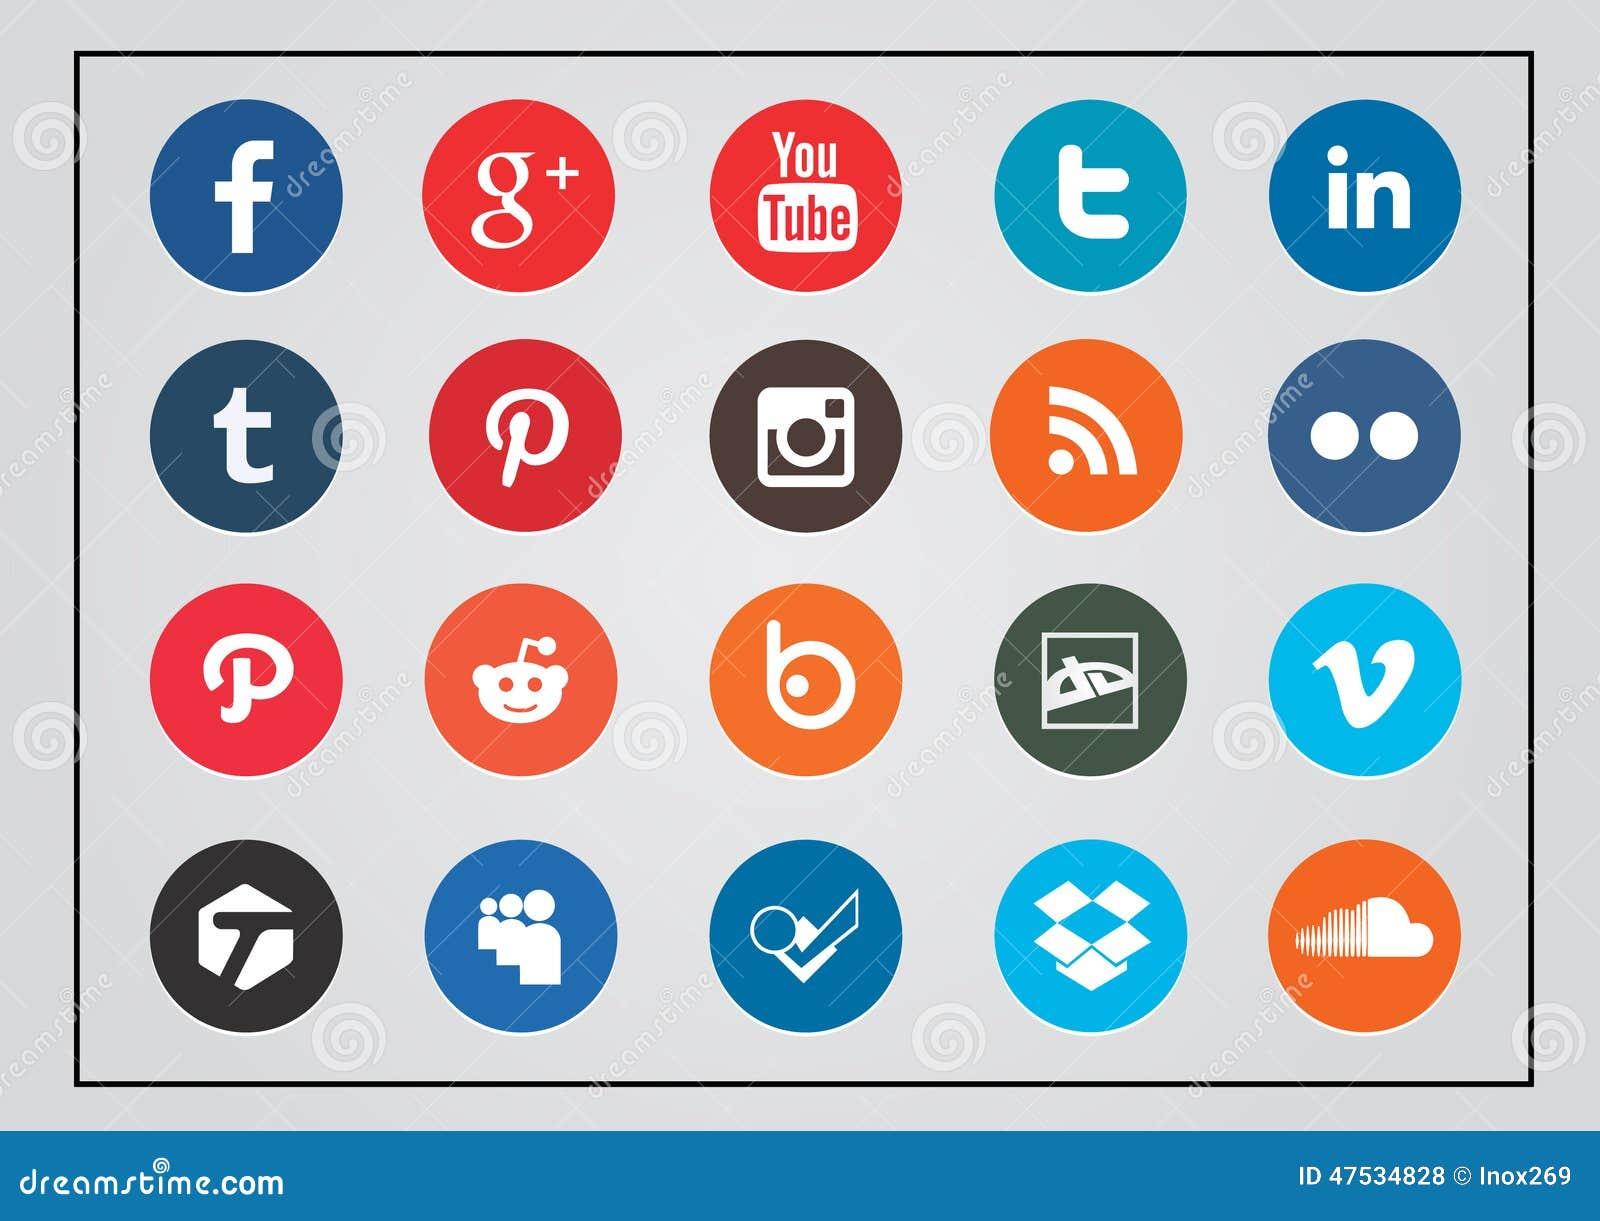 the social medias outlook in the modern society